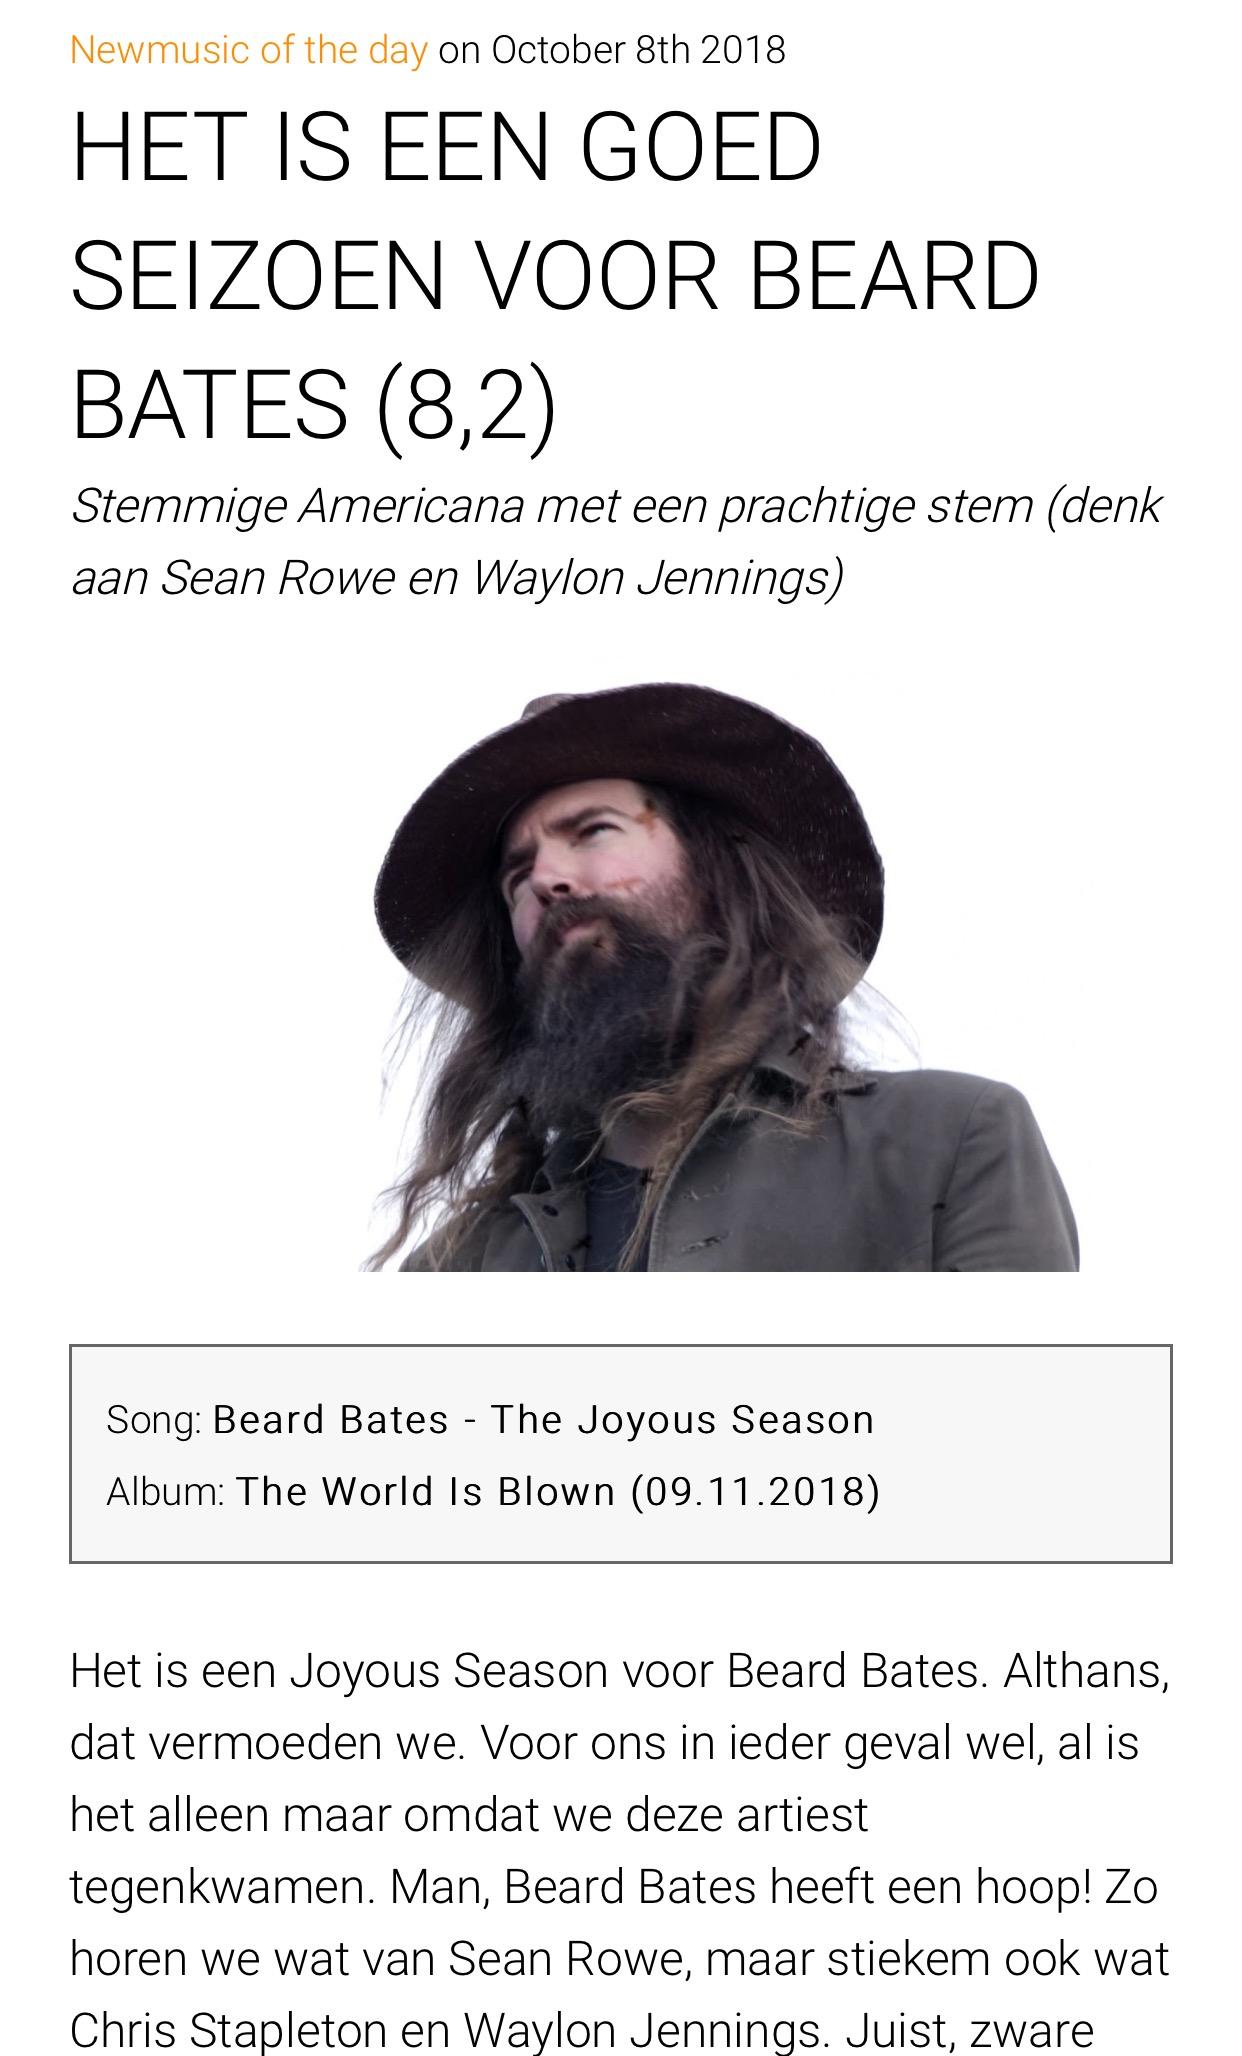 Beard Bates - Gobsmag - Joyous Season Feature